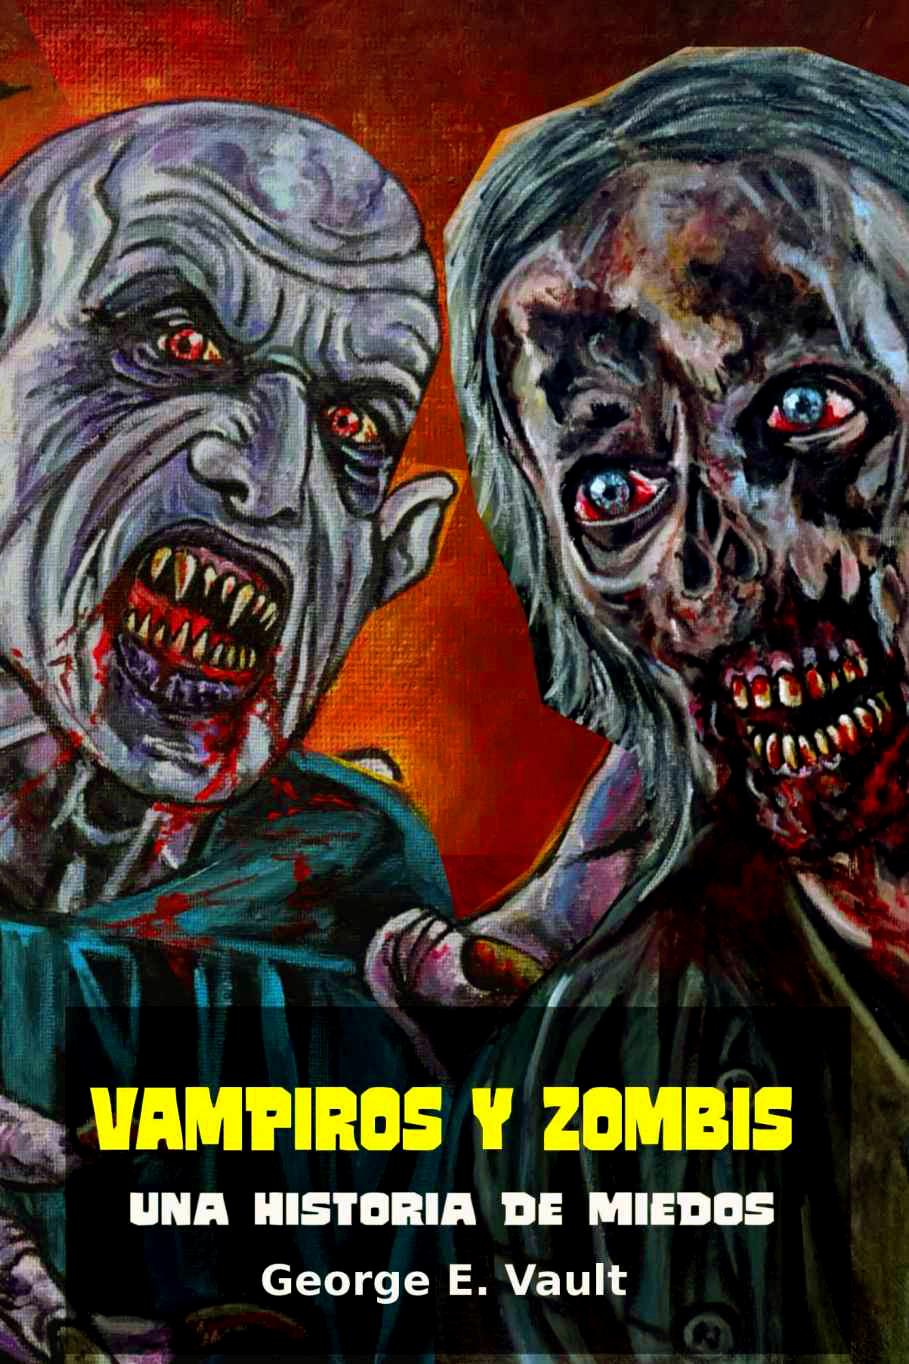 Vampiros y Zombies George E.Vault